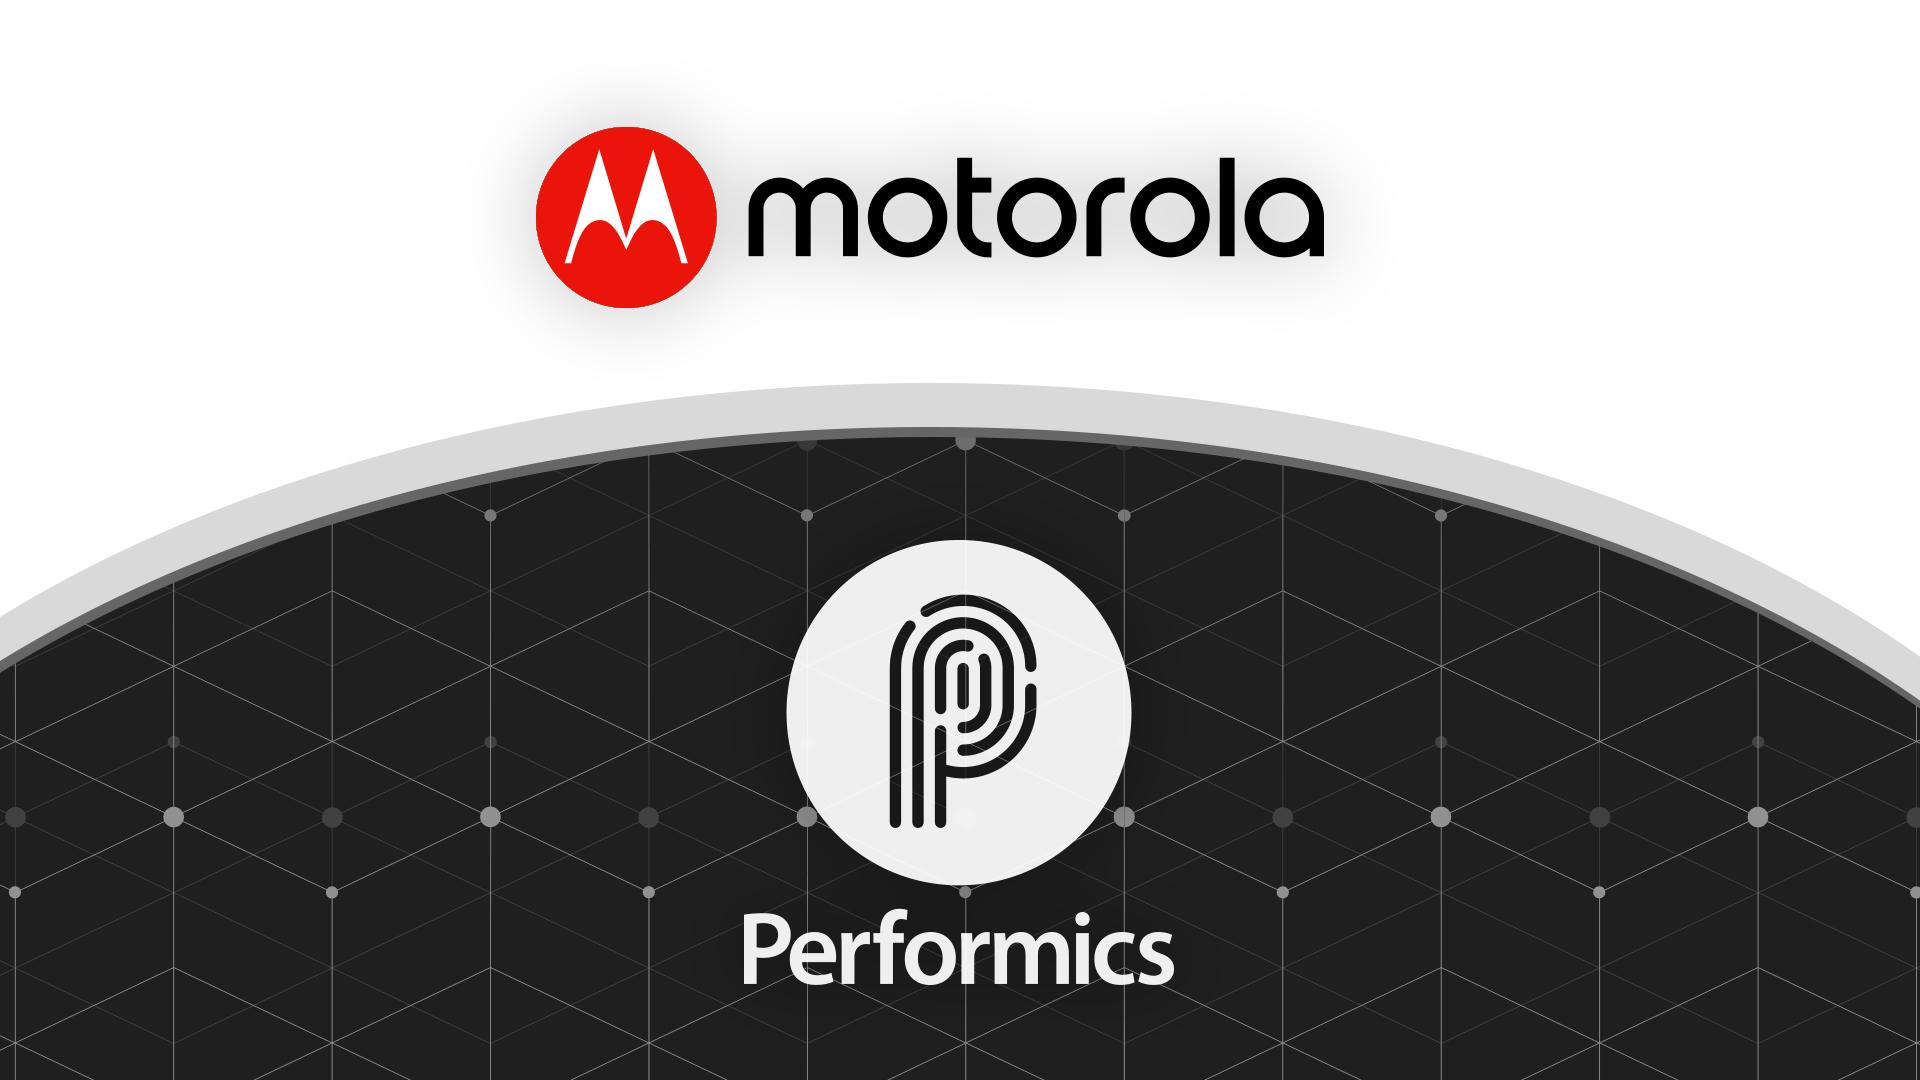 Case study: Performics + Motorola